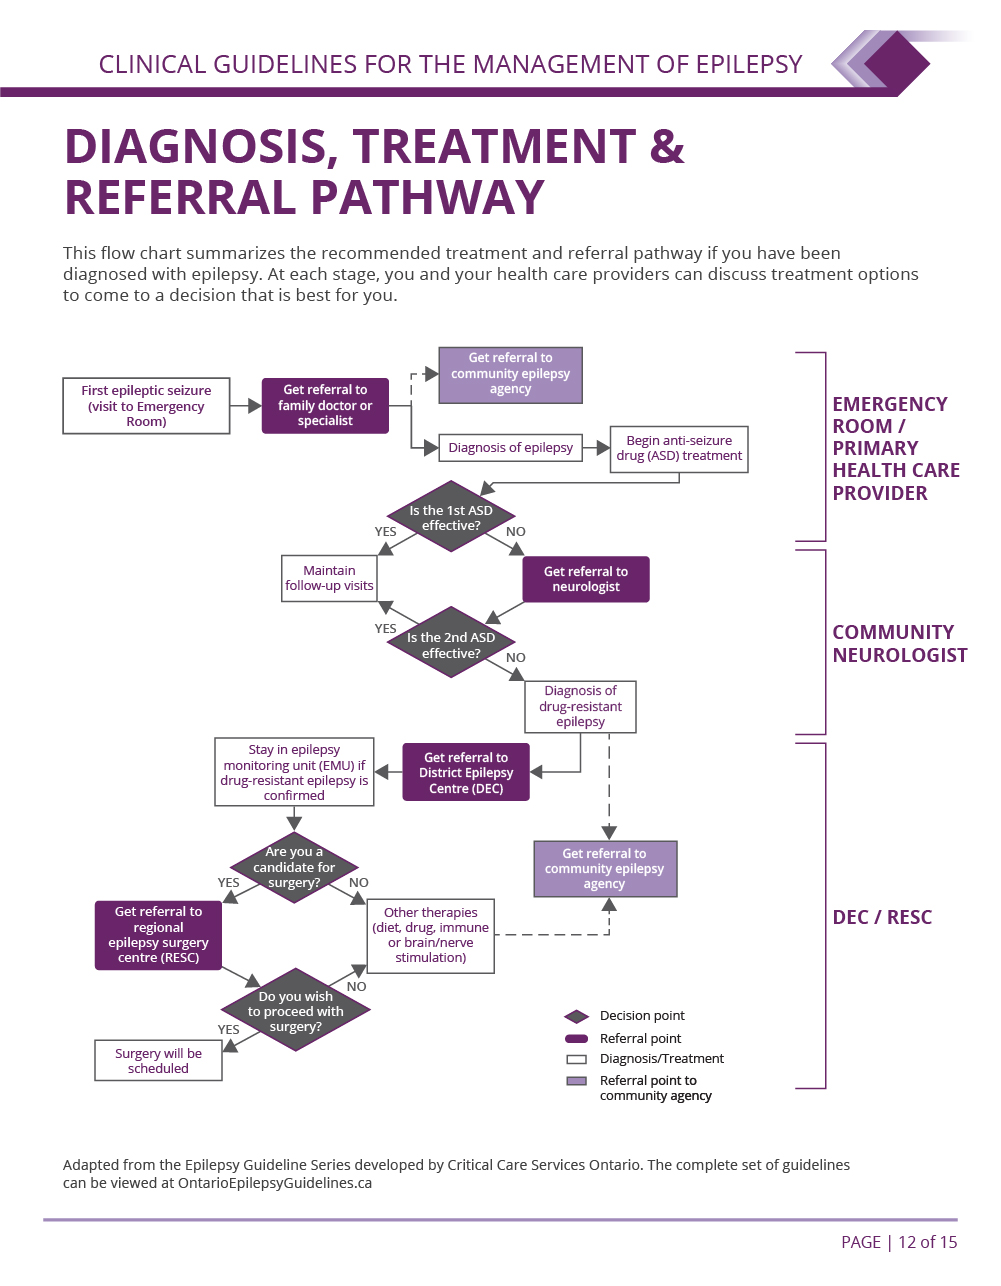 Patient Referral Pathway